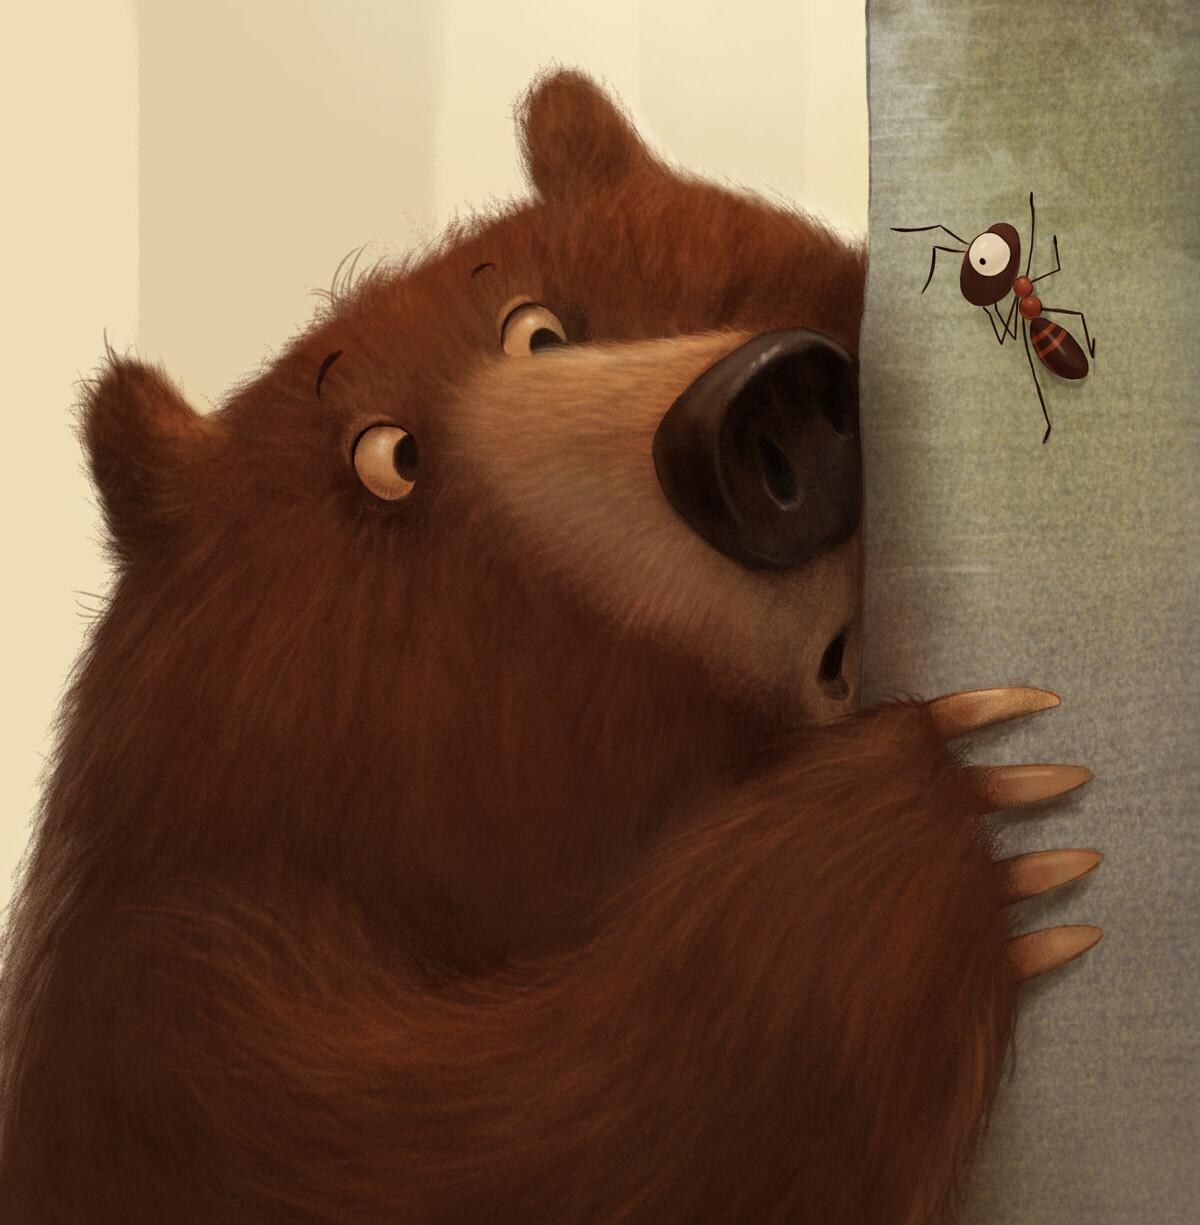 A bear and an ant